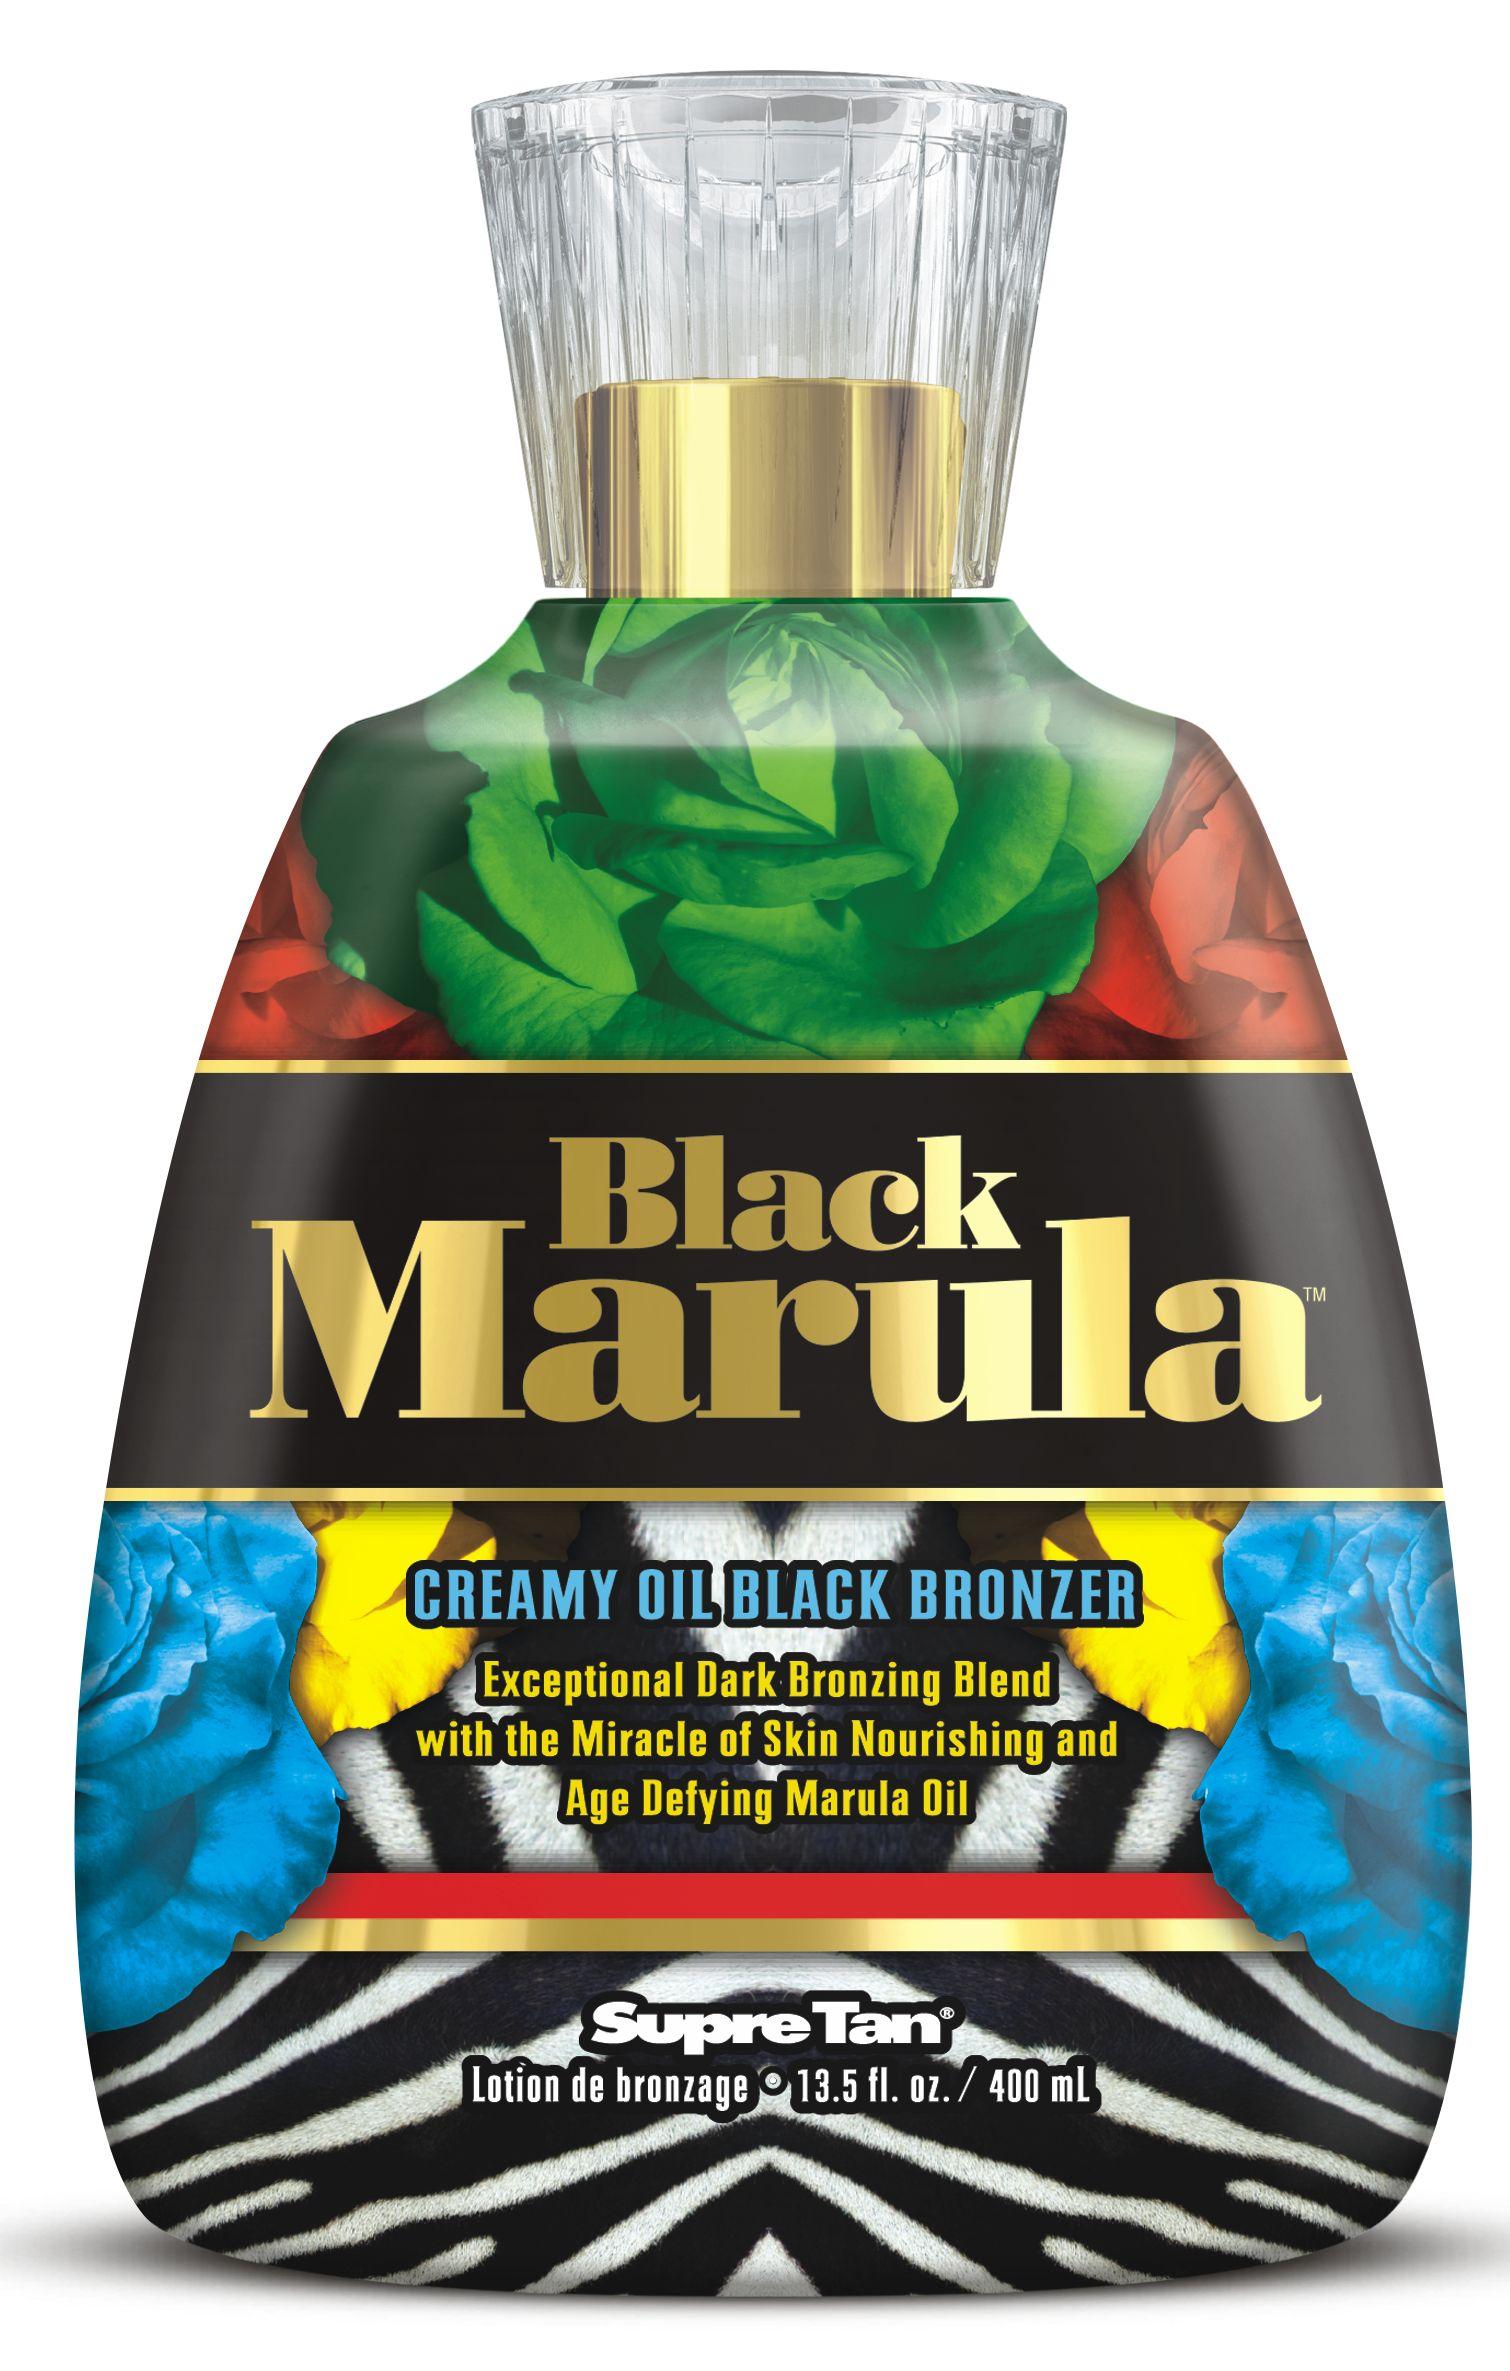 Black Marula™ Creamy Oil Black Bronzer